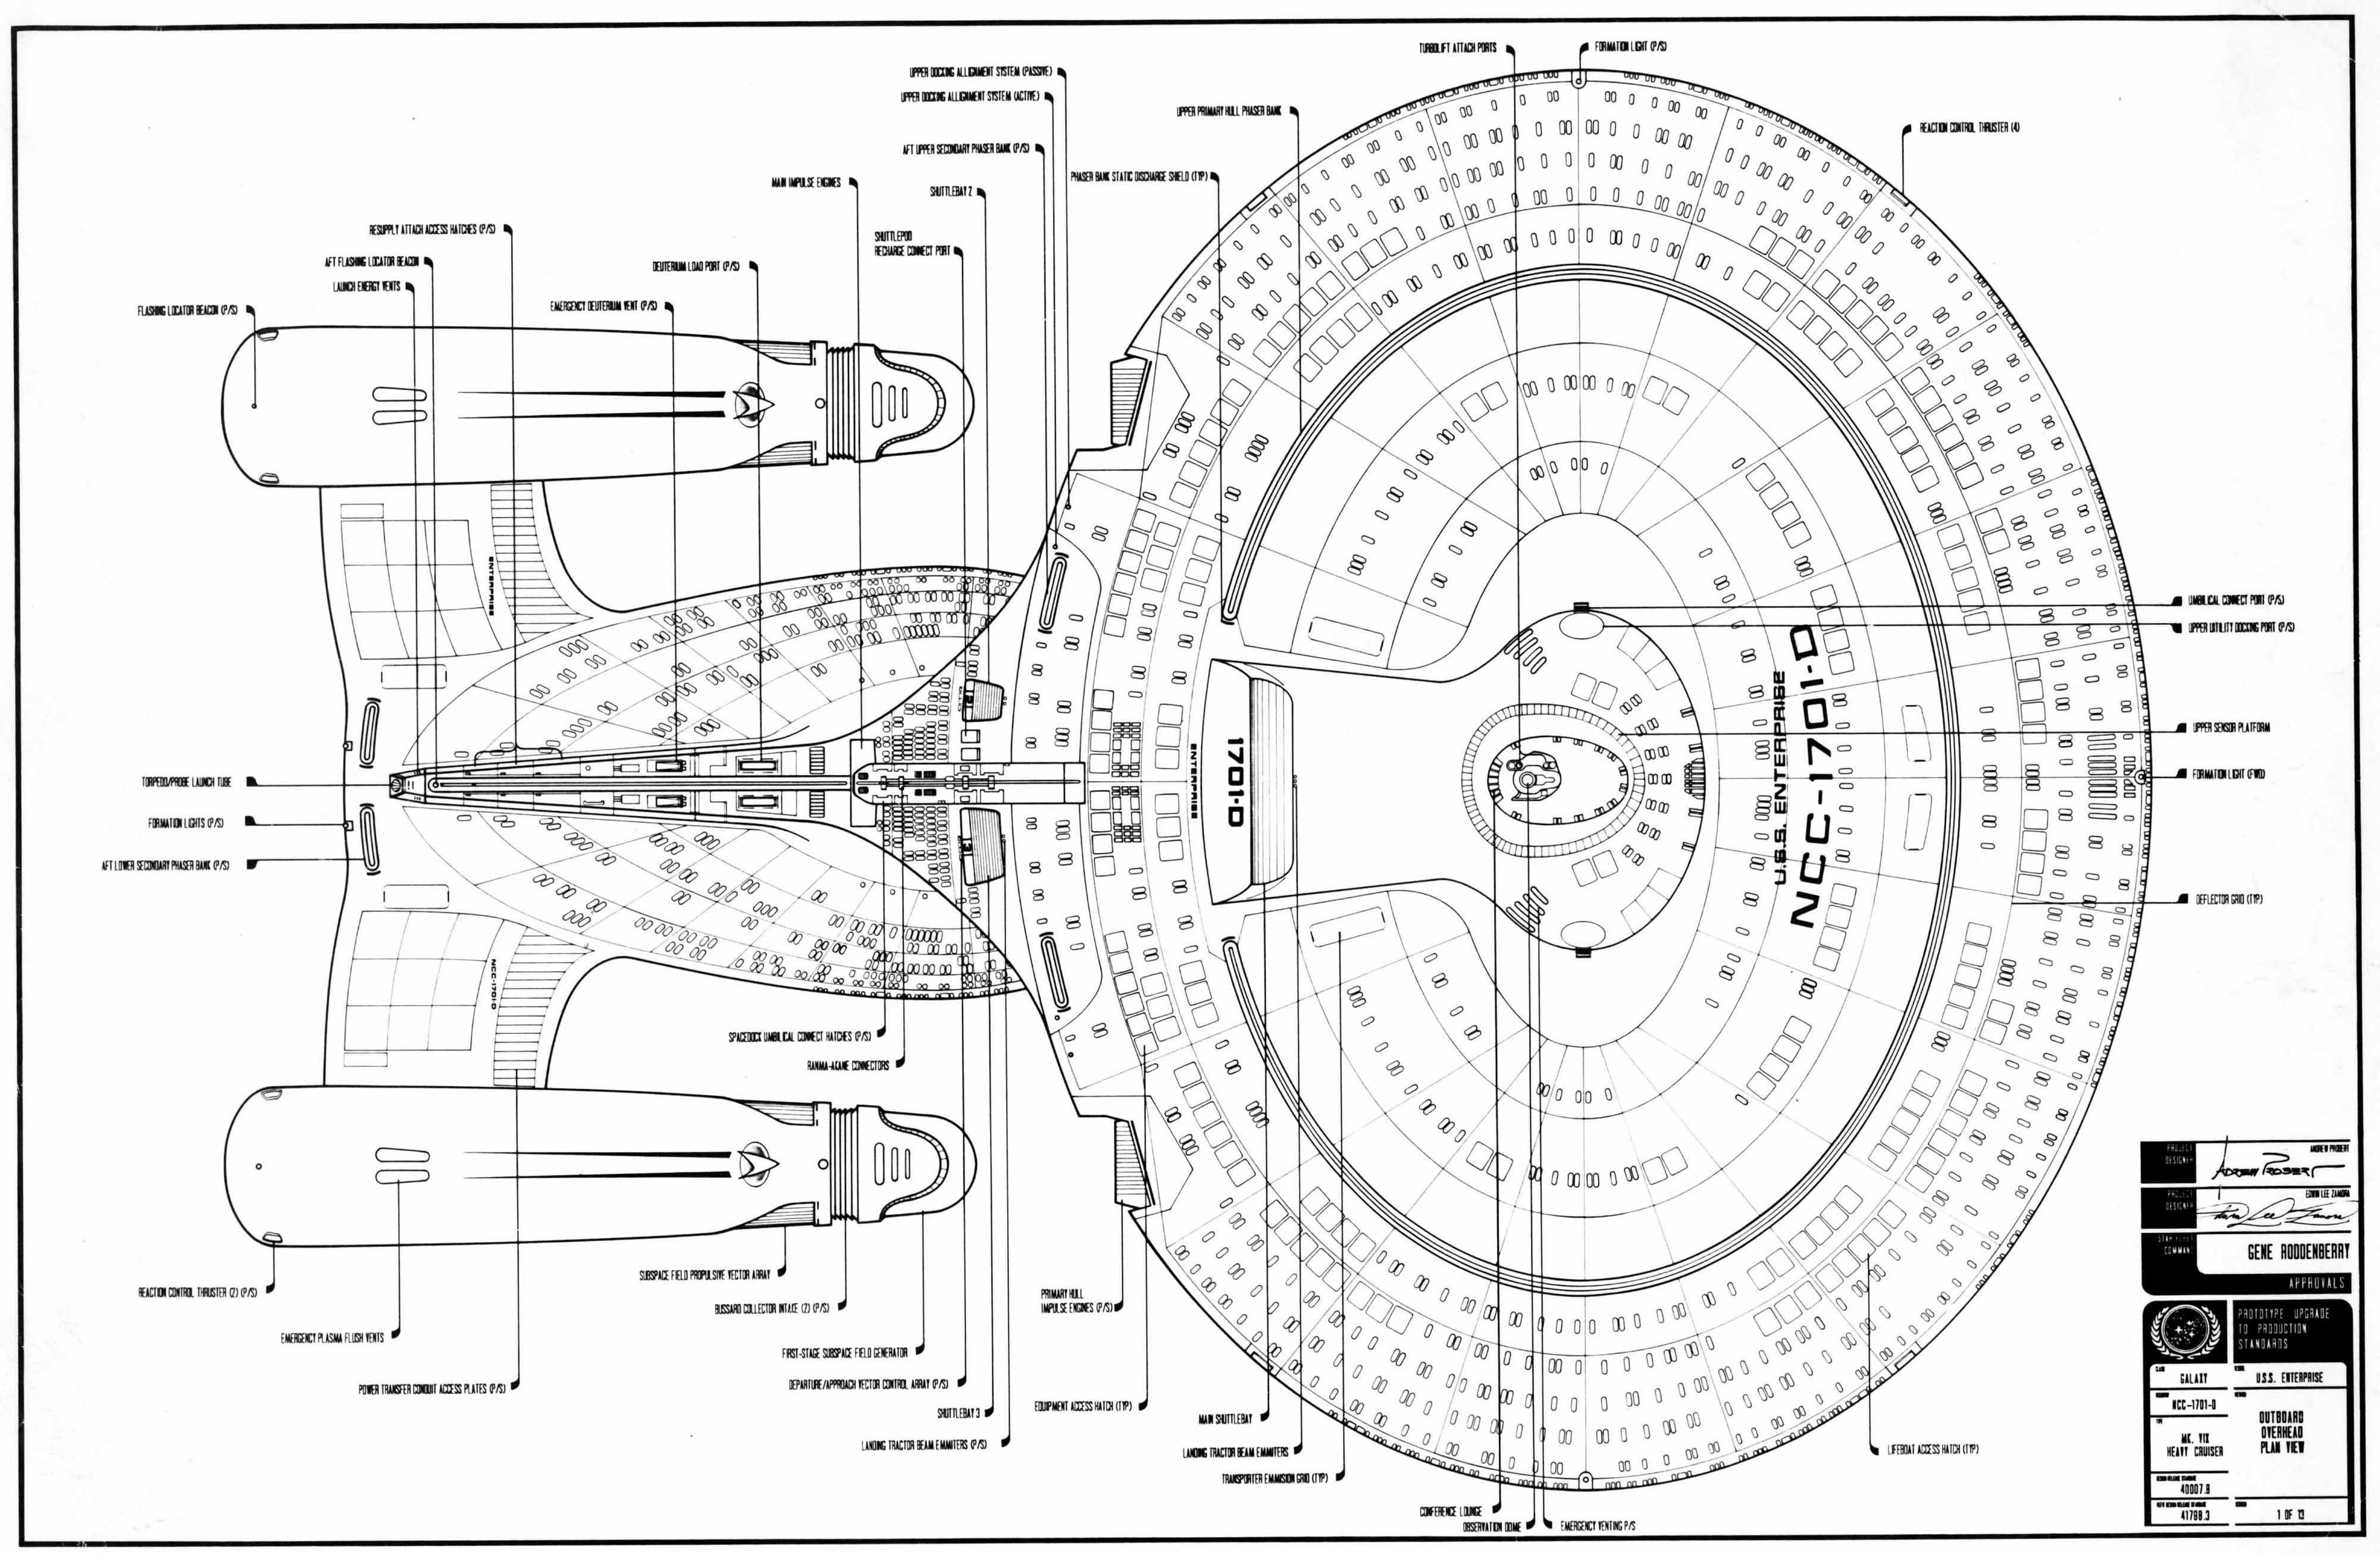 Schematic Dorsal View Of U S S Enterprise Ncc D